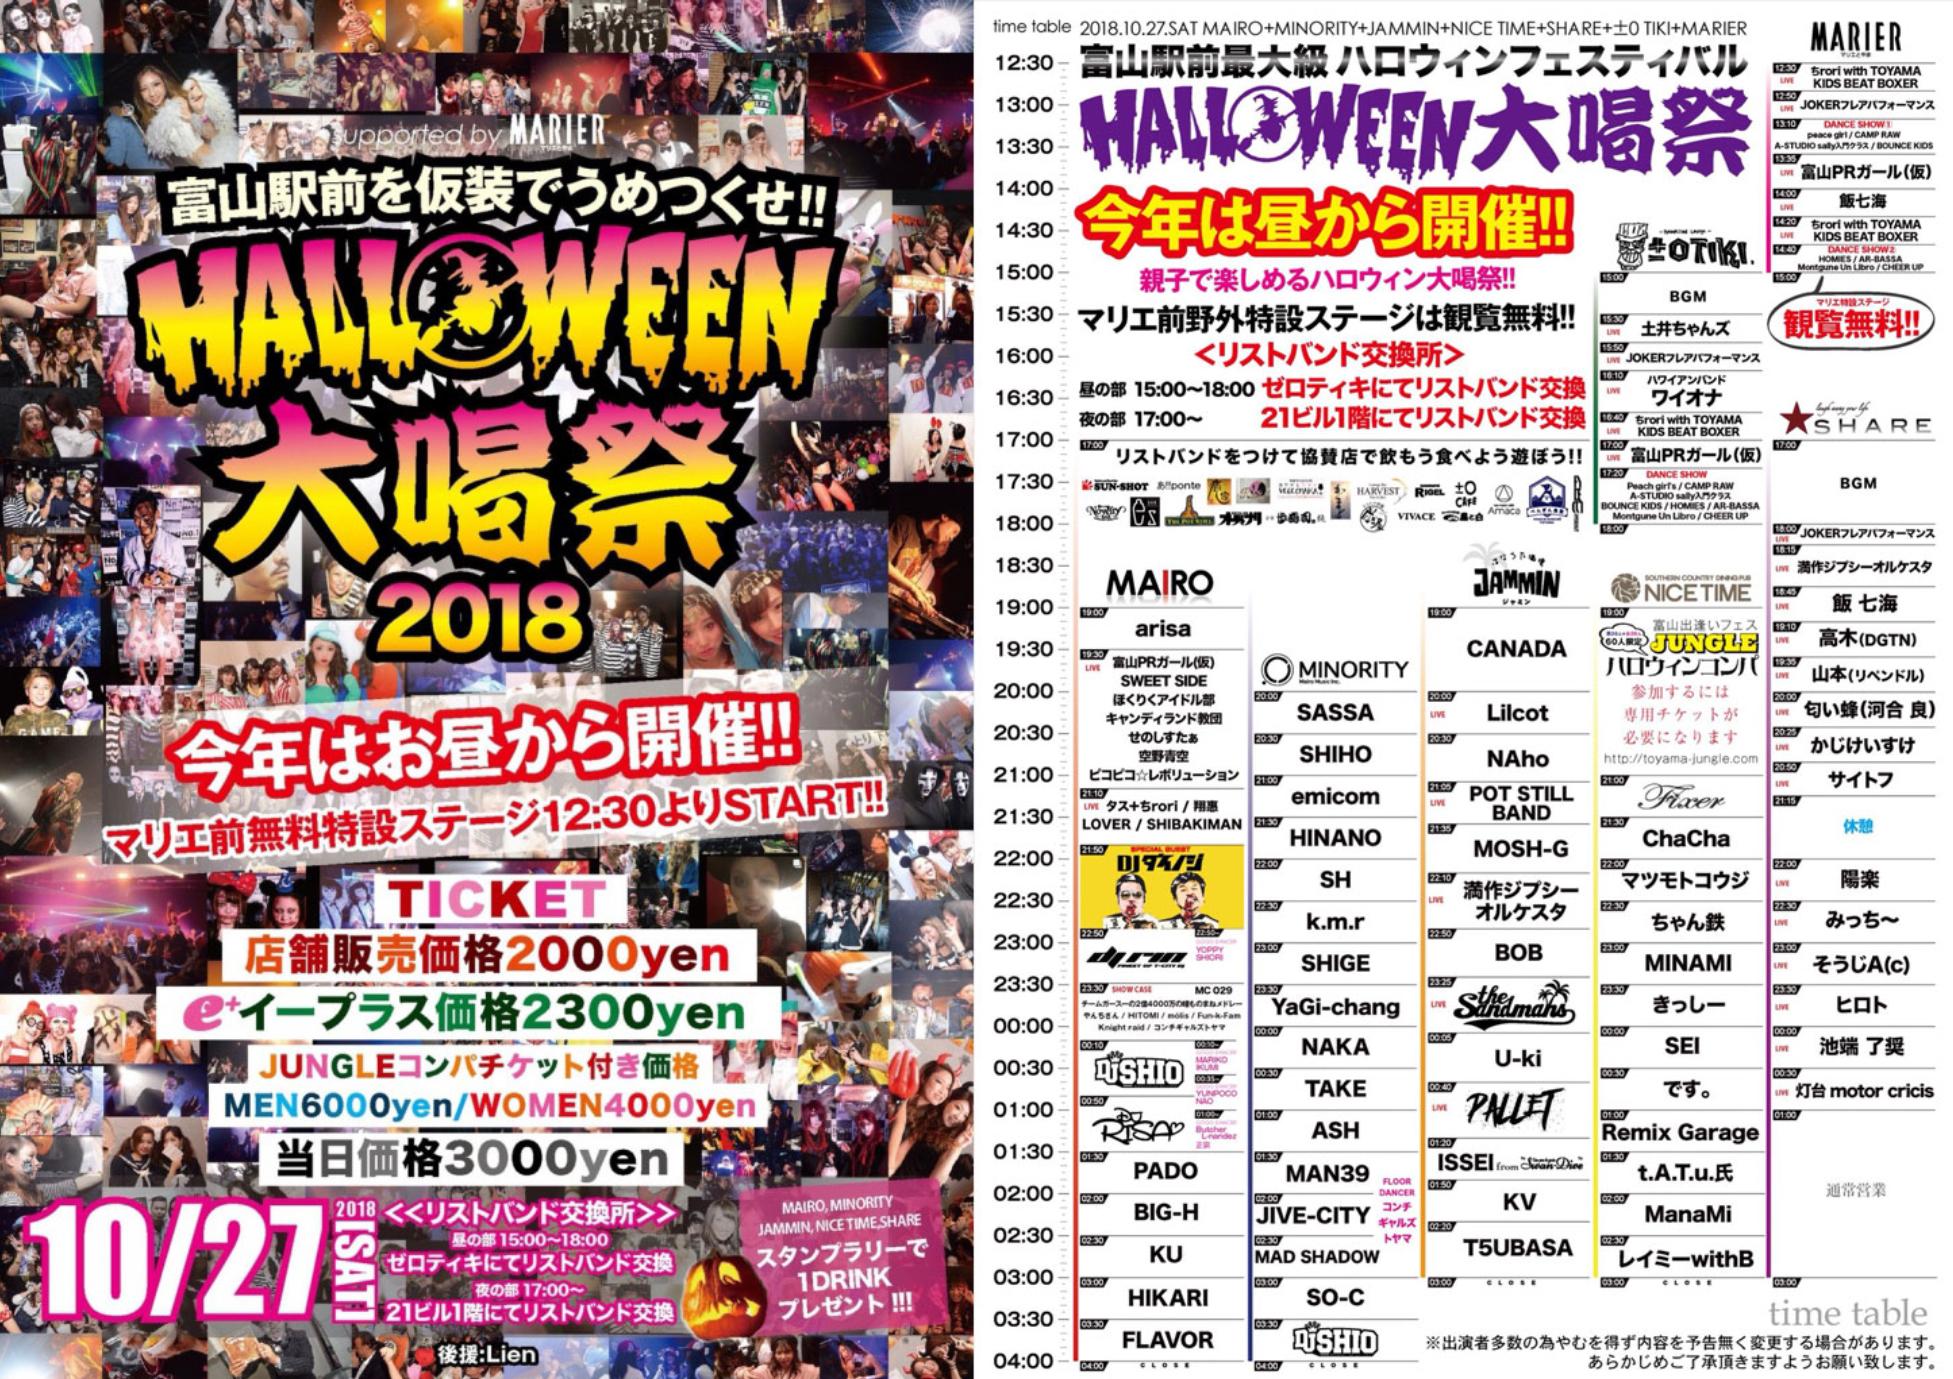 富山駅前5店舗同時開催「ハロウィン大喝采2018」(10/27)